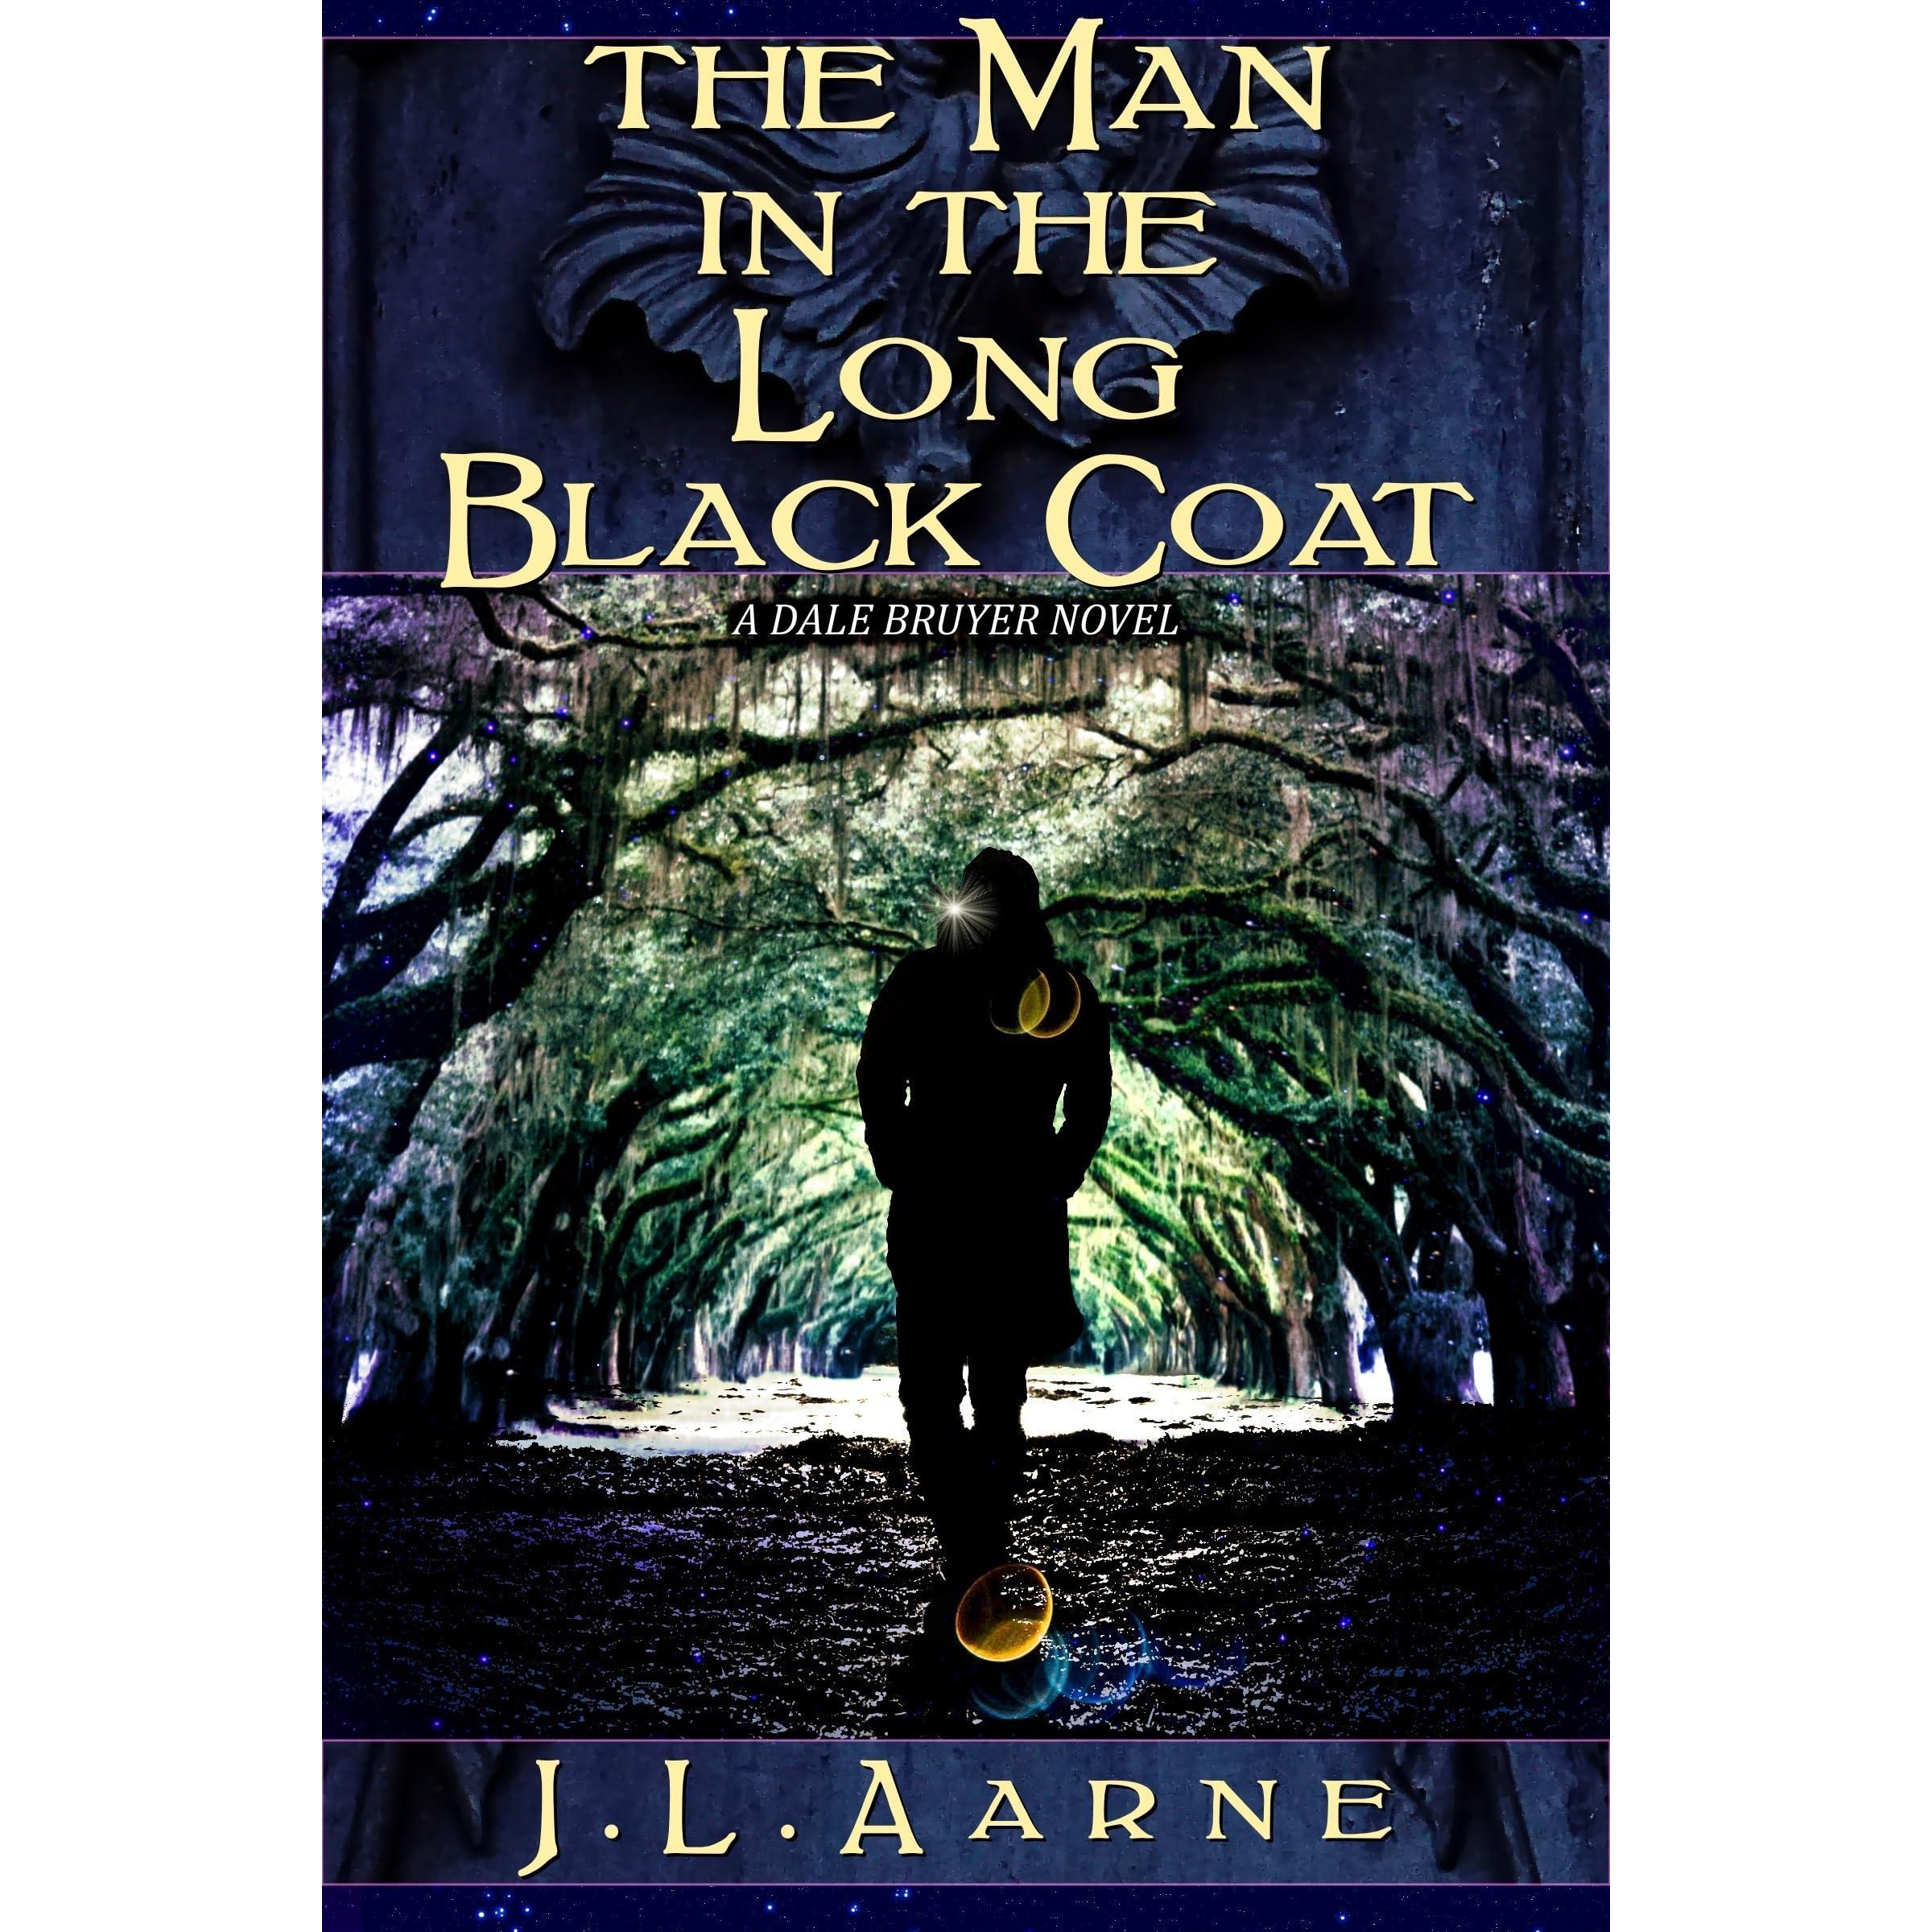 long black coat movie